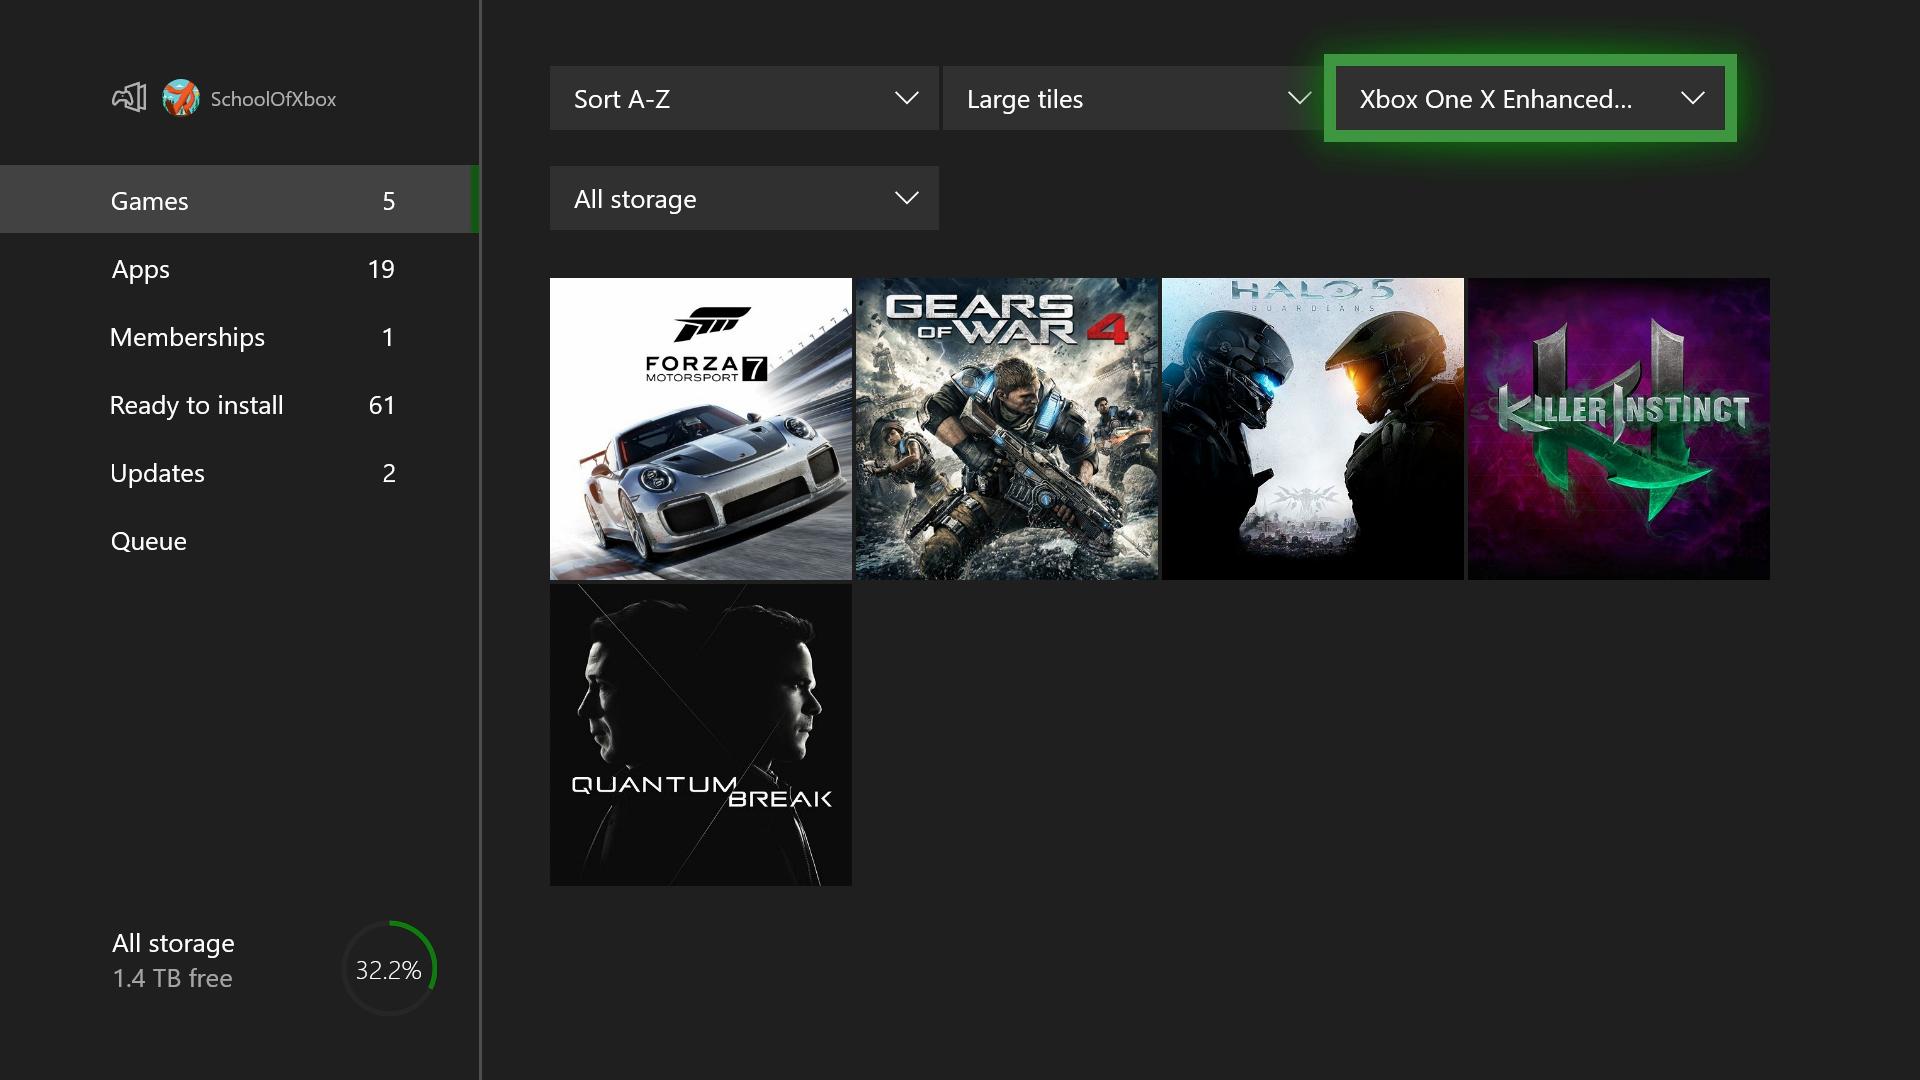 Como Se Si Mis Juegos Estan Actualizados Para Xbox One X